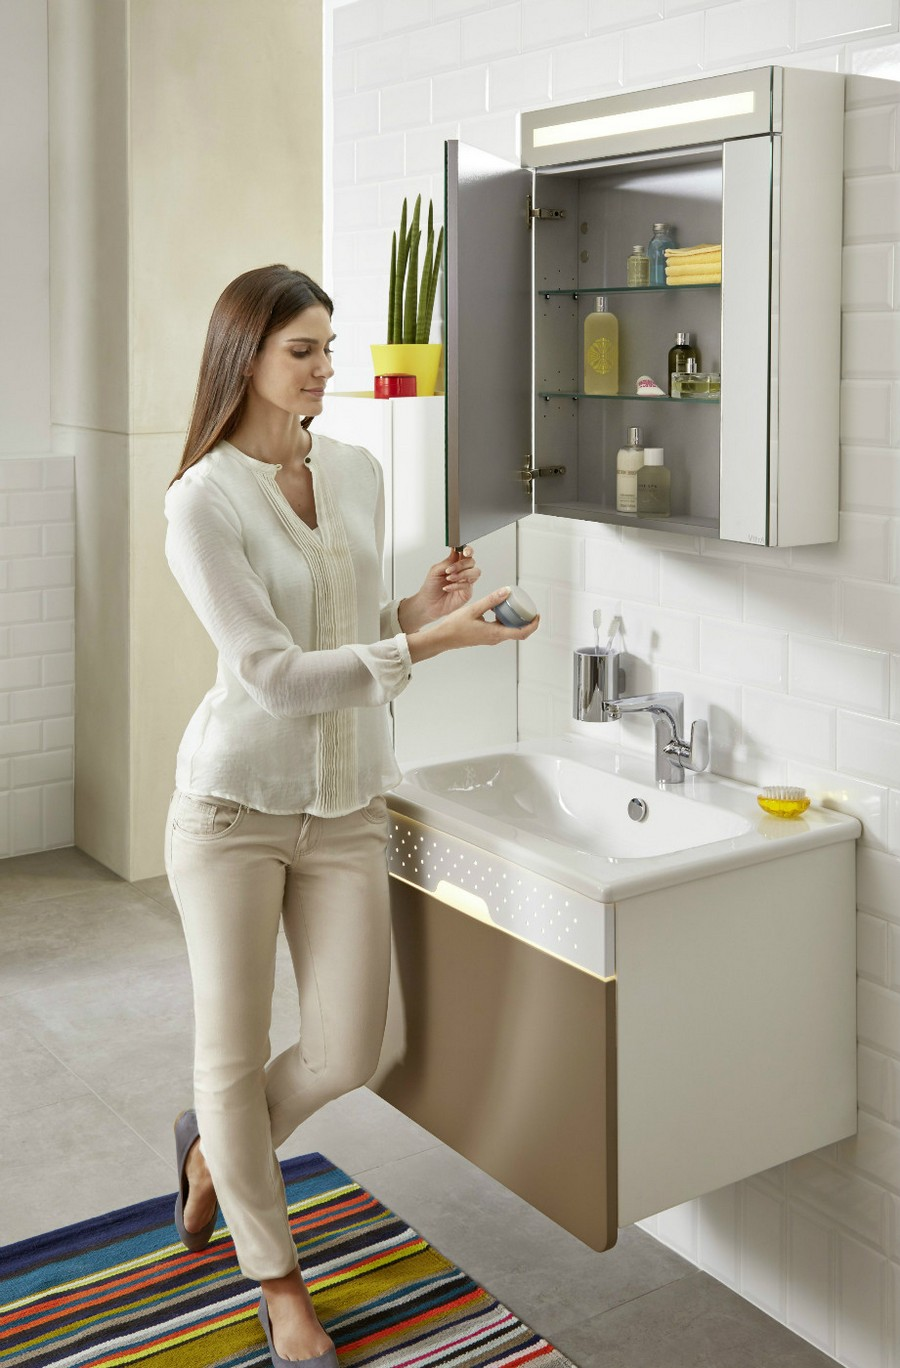 3-1-Vitra-beige-bathroom-interior-design-wash-basin-wall-mounted-vanity-unit-stripy-rug